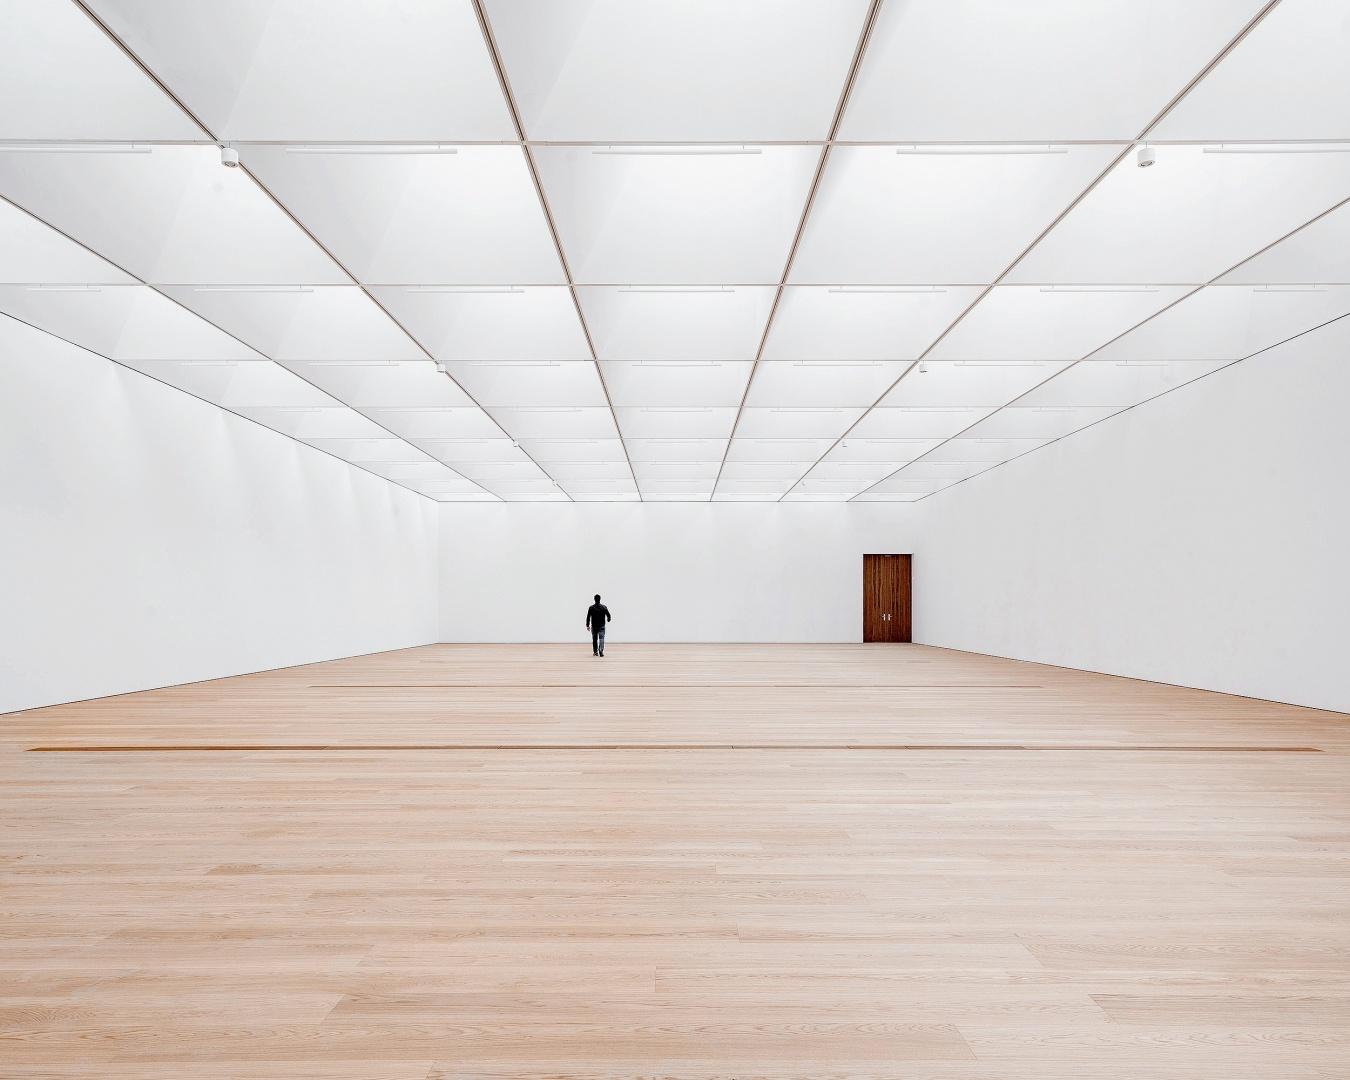 Die Volumen der Museumsräume können nach Bedarf angepasst werden. © Matthieu Gafsou